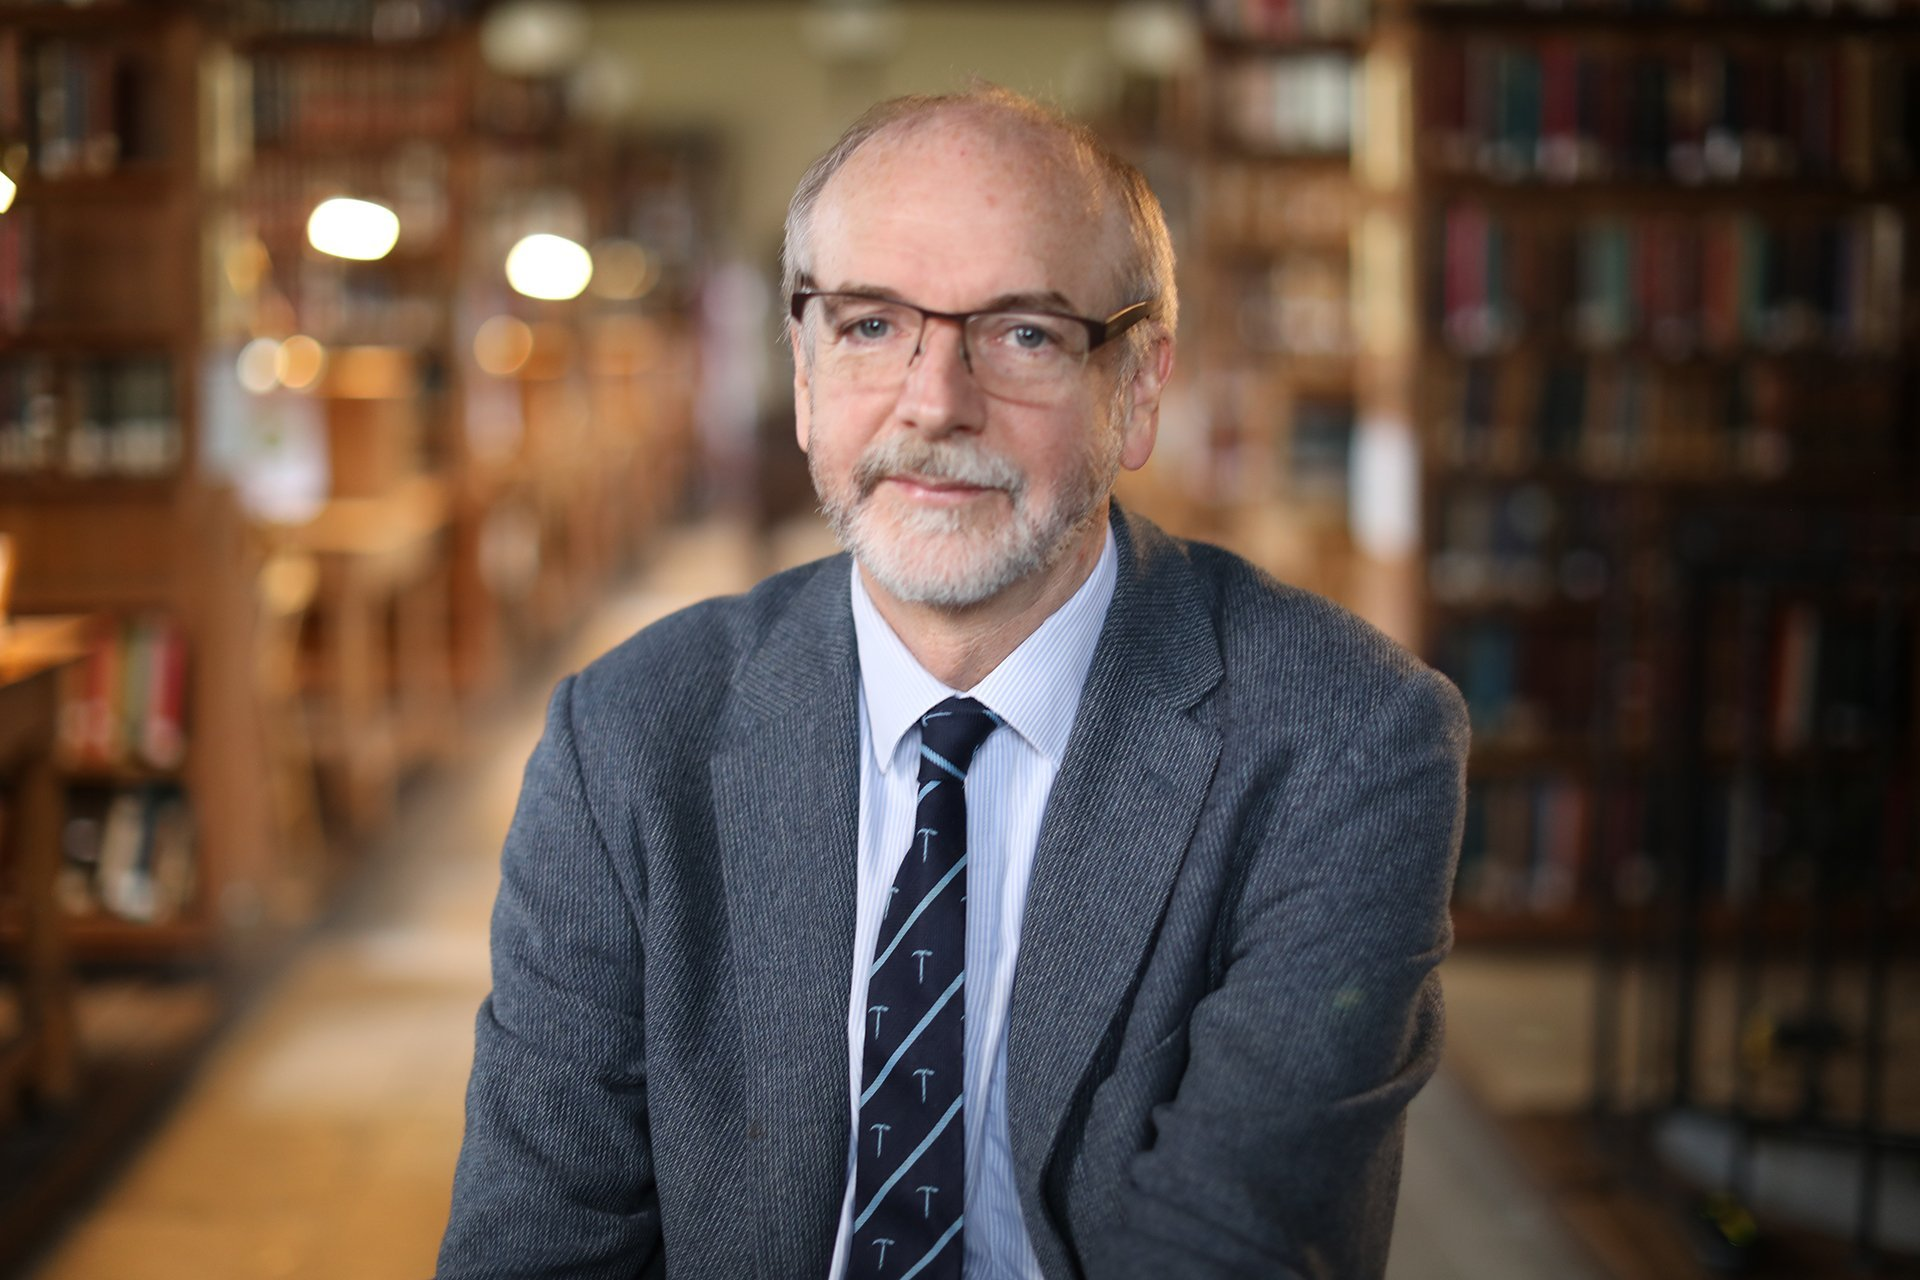 Prof Pollard